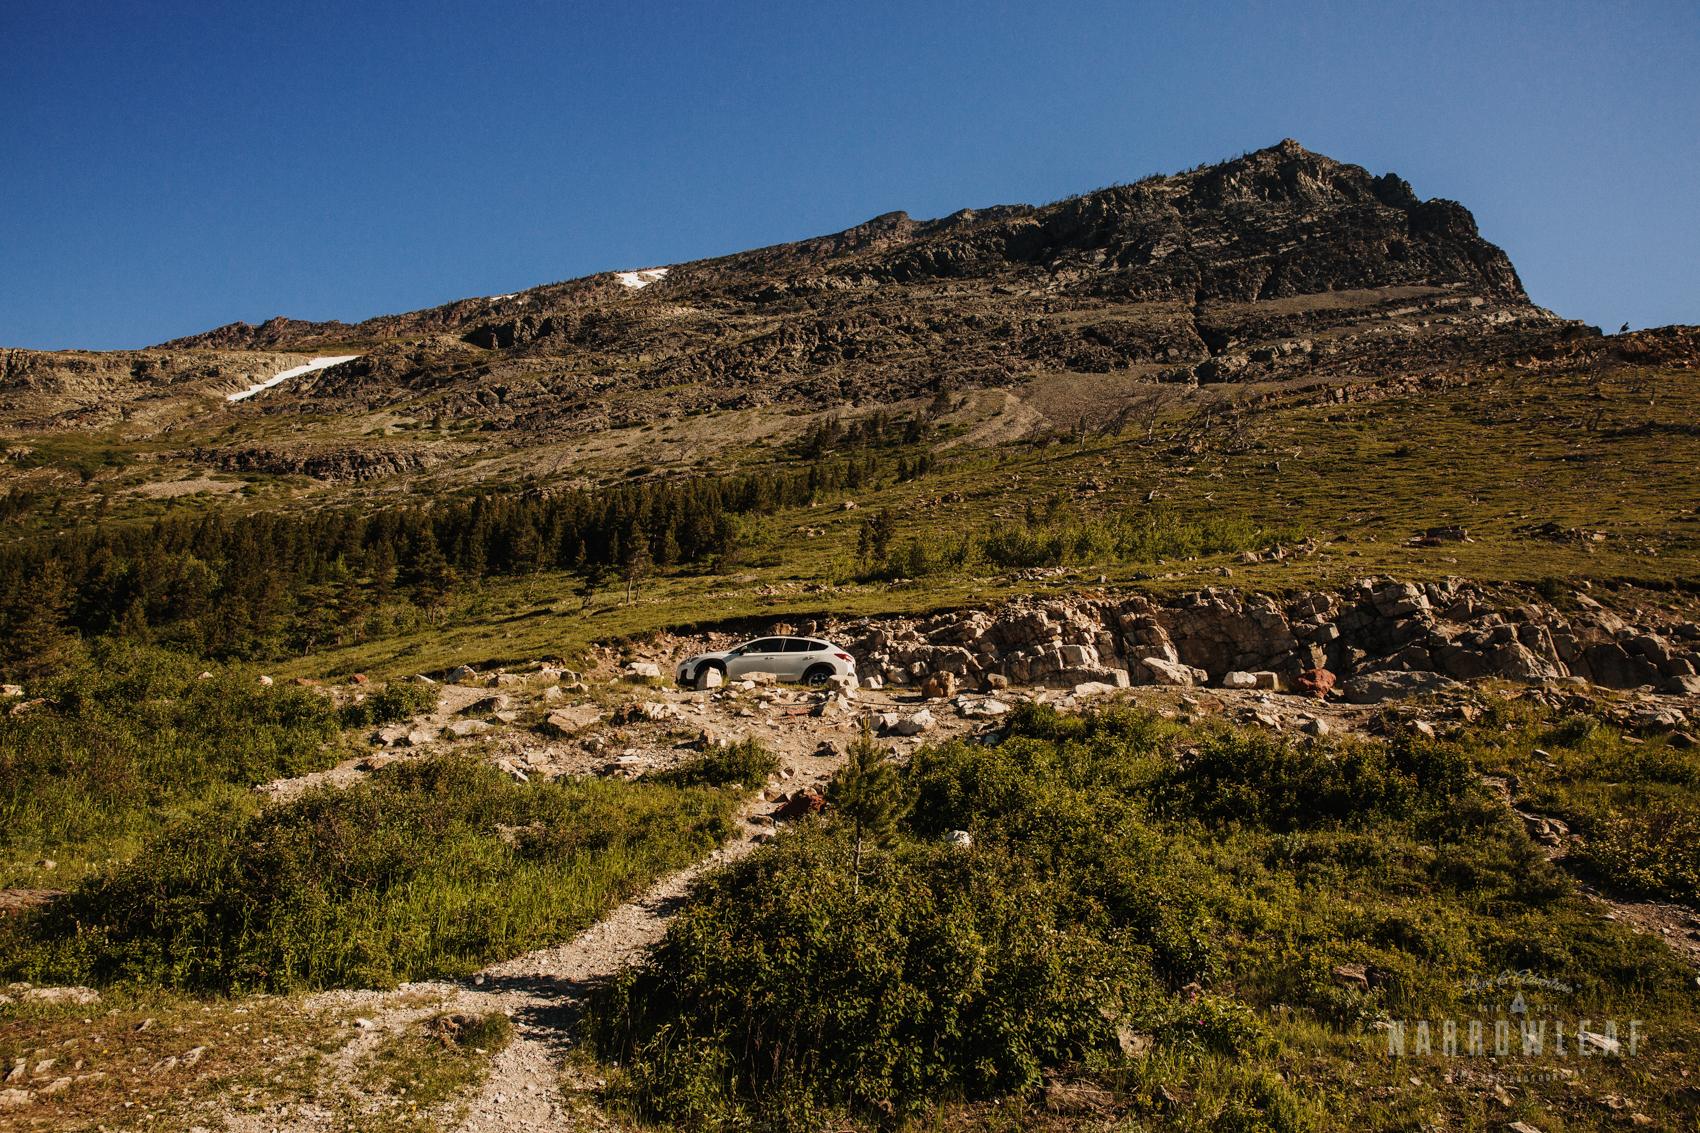 Montana-Glacier-National-Park-Many-Glacier-Narrowleaf-Love-and-Adventure-elopement-Photography-9271.jpg